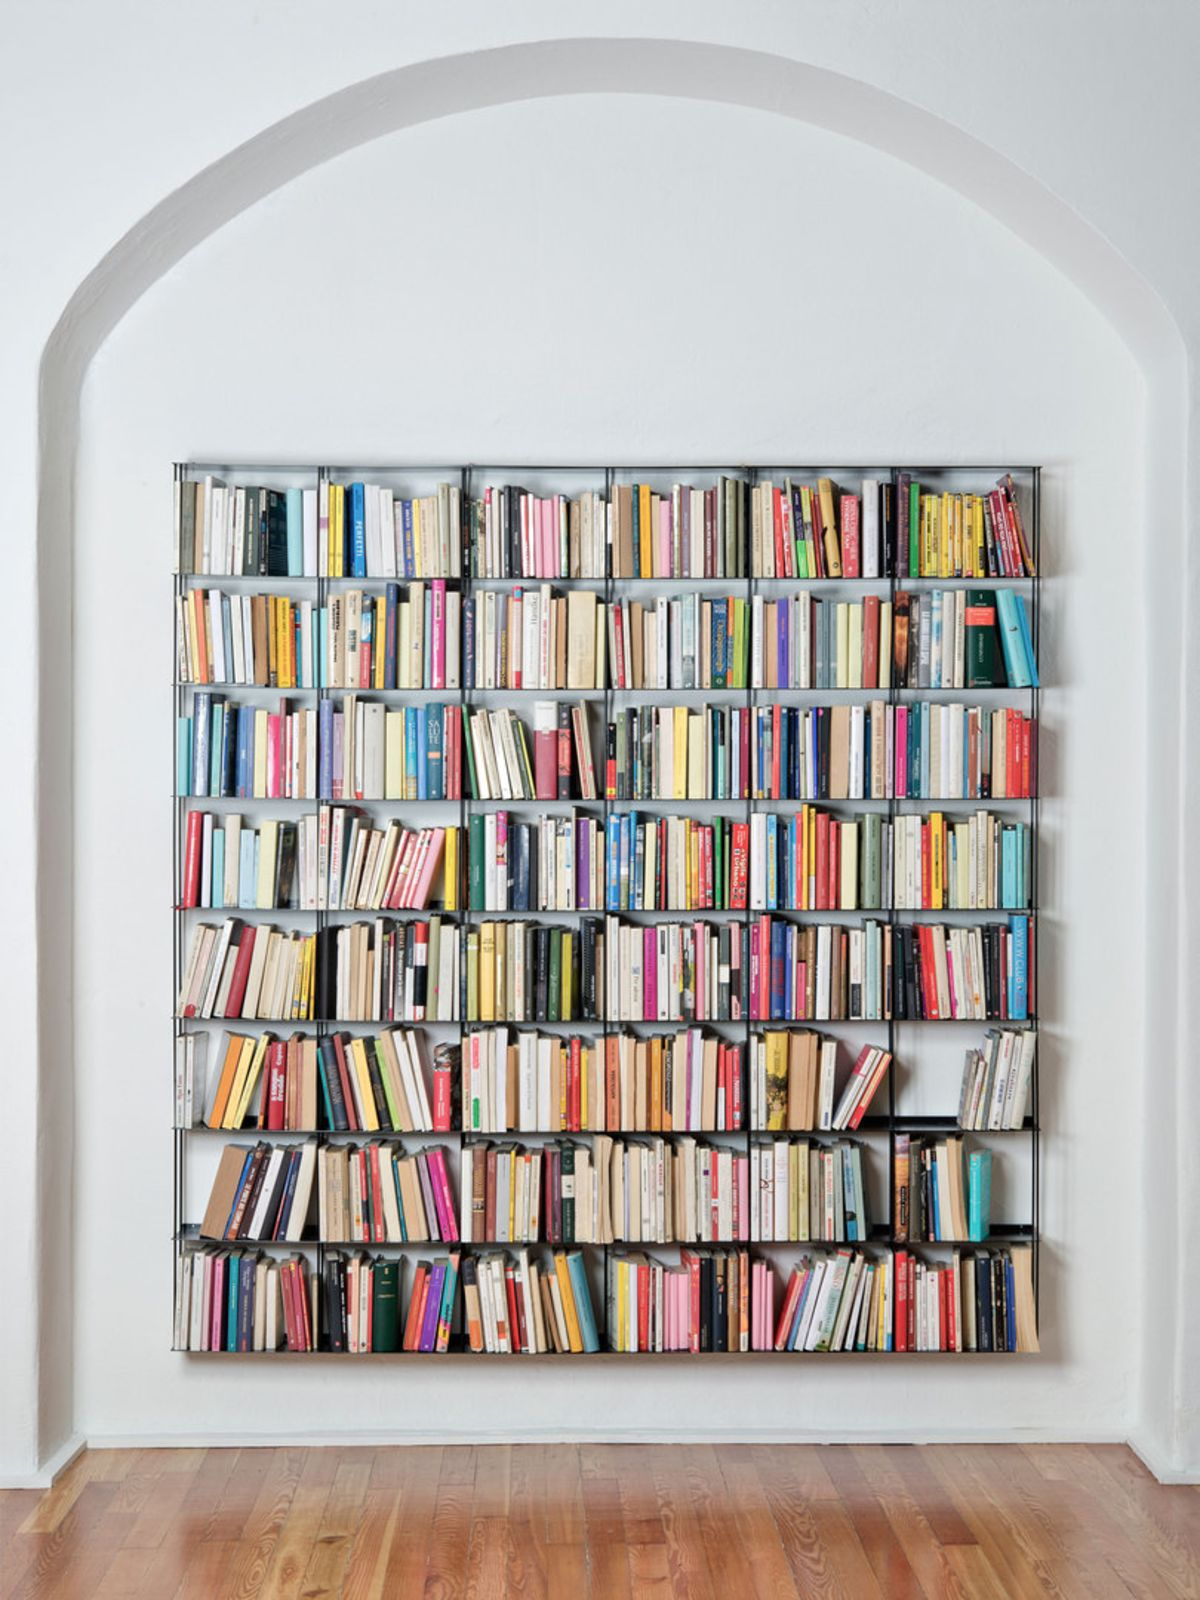 Libreria Krossing by Kriptonite